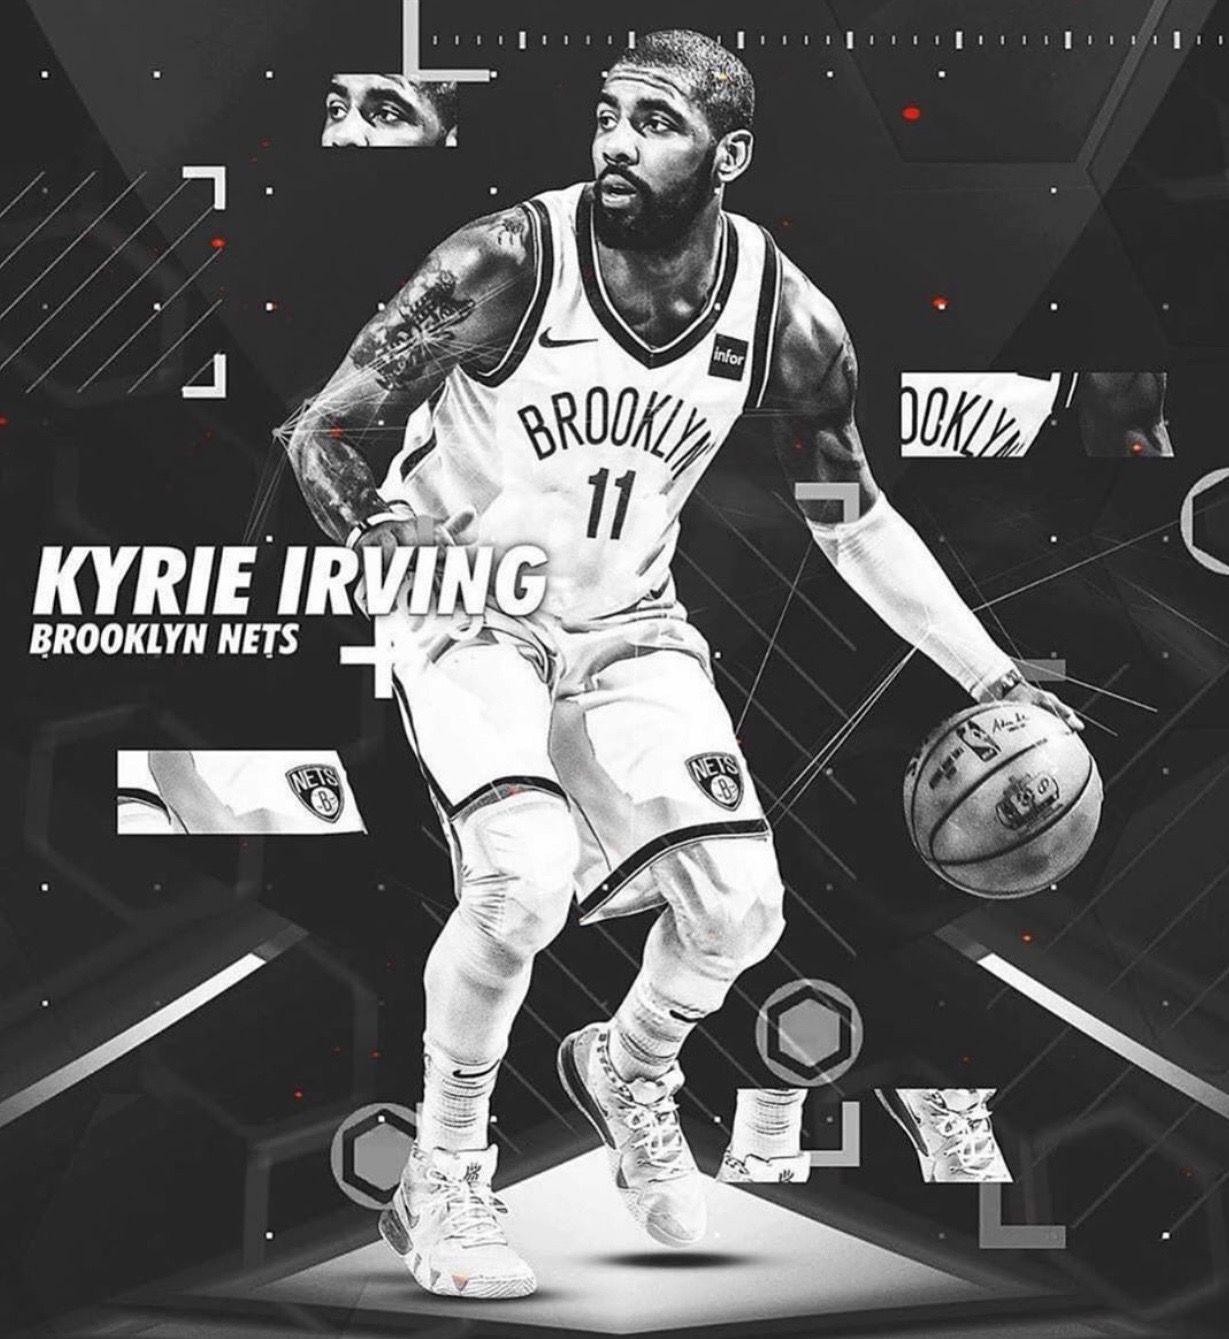 KyrieIrving NBA Irving basketball, Kyrie